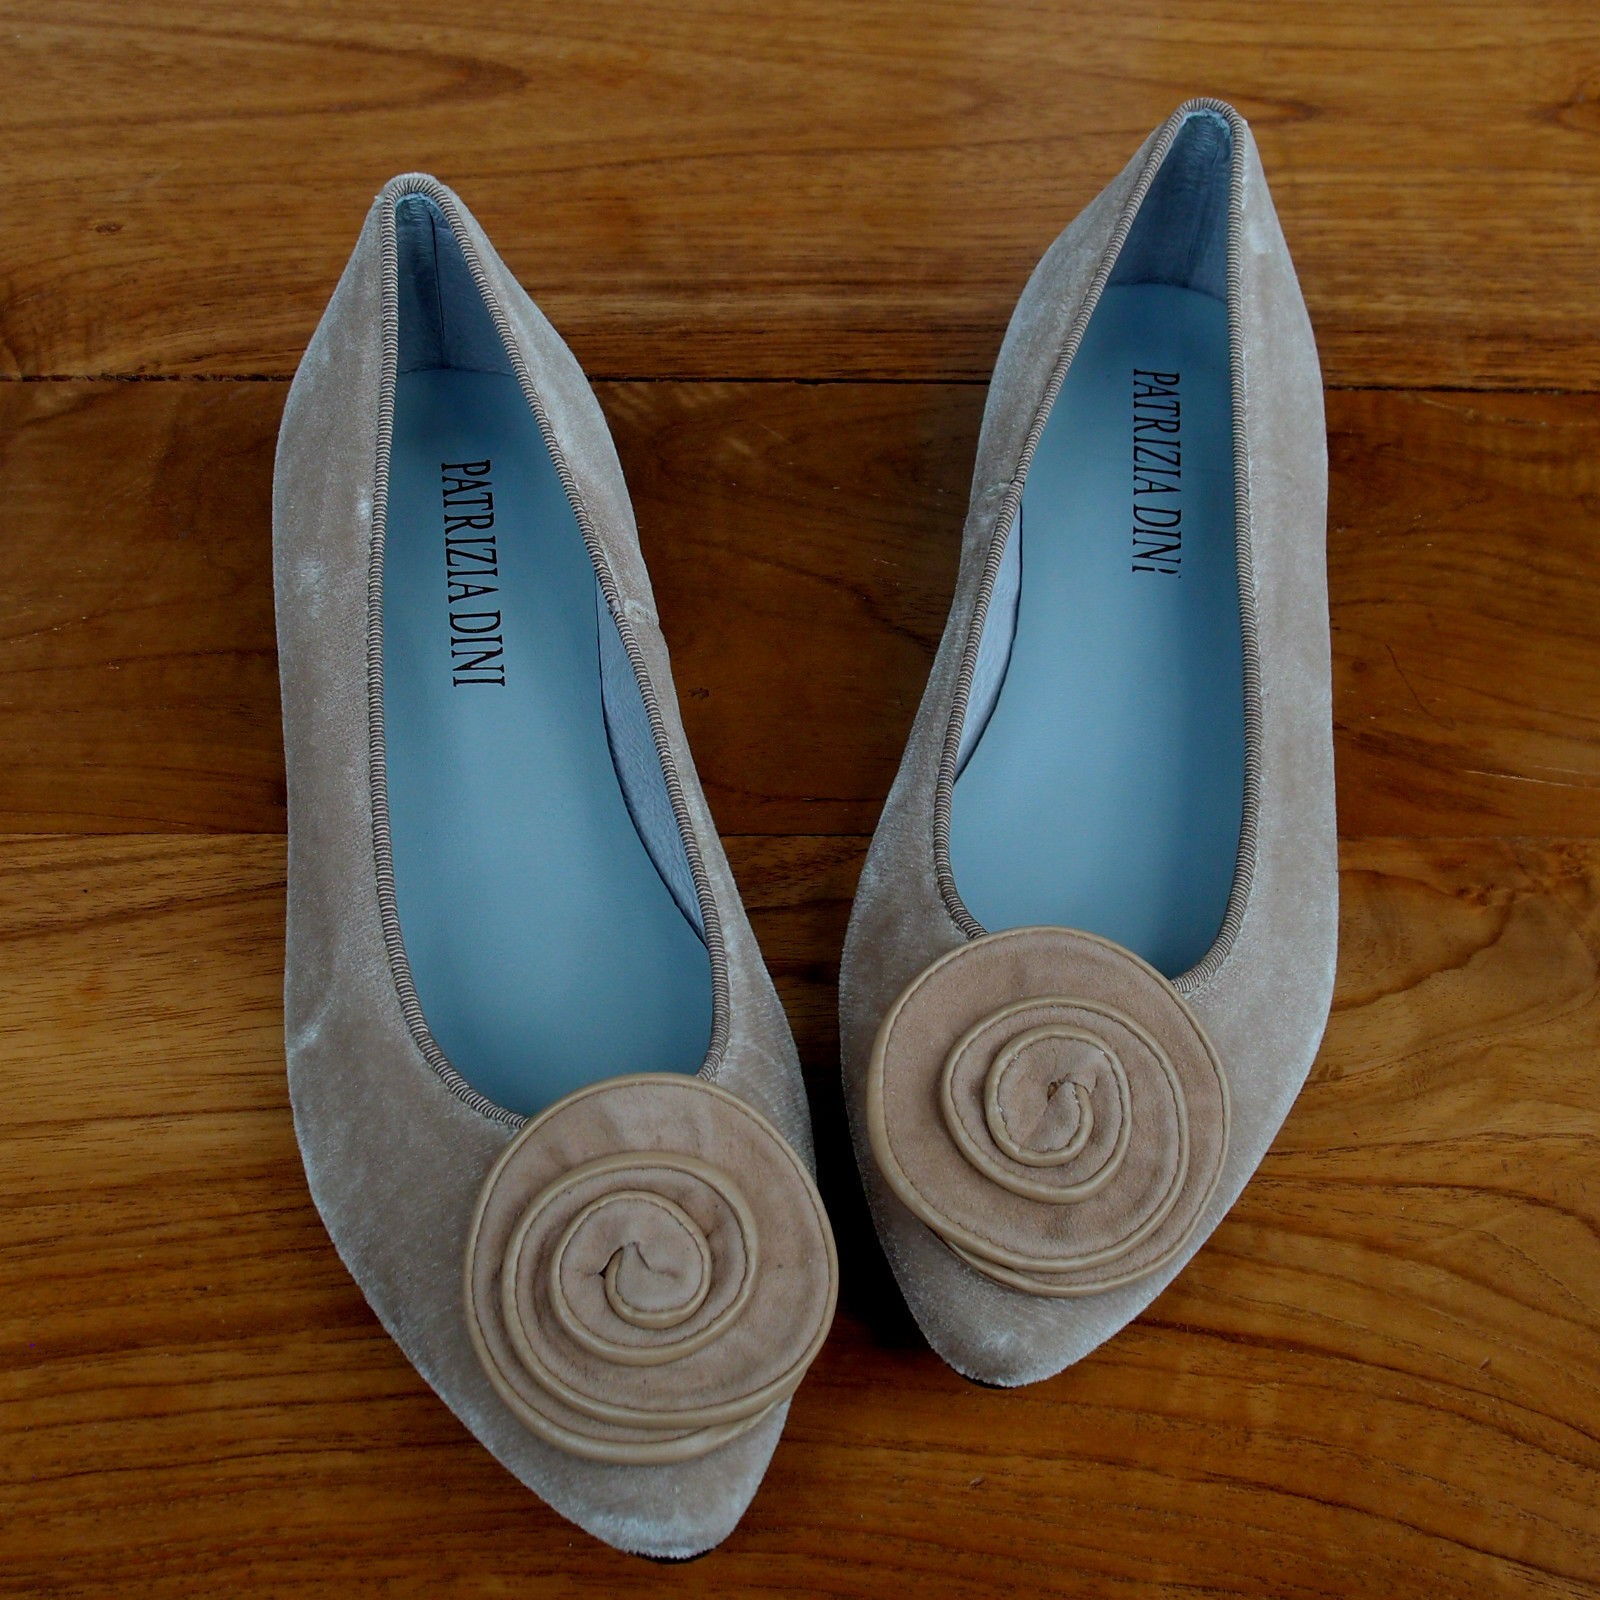 Patrizia Scarpe Natura Donna Slipper Velluto Heine Dini Ballerina rB6F4r